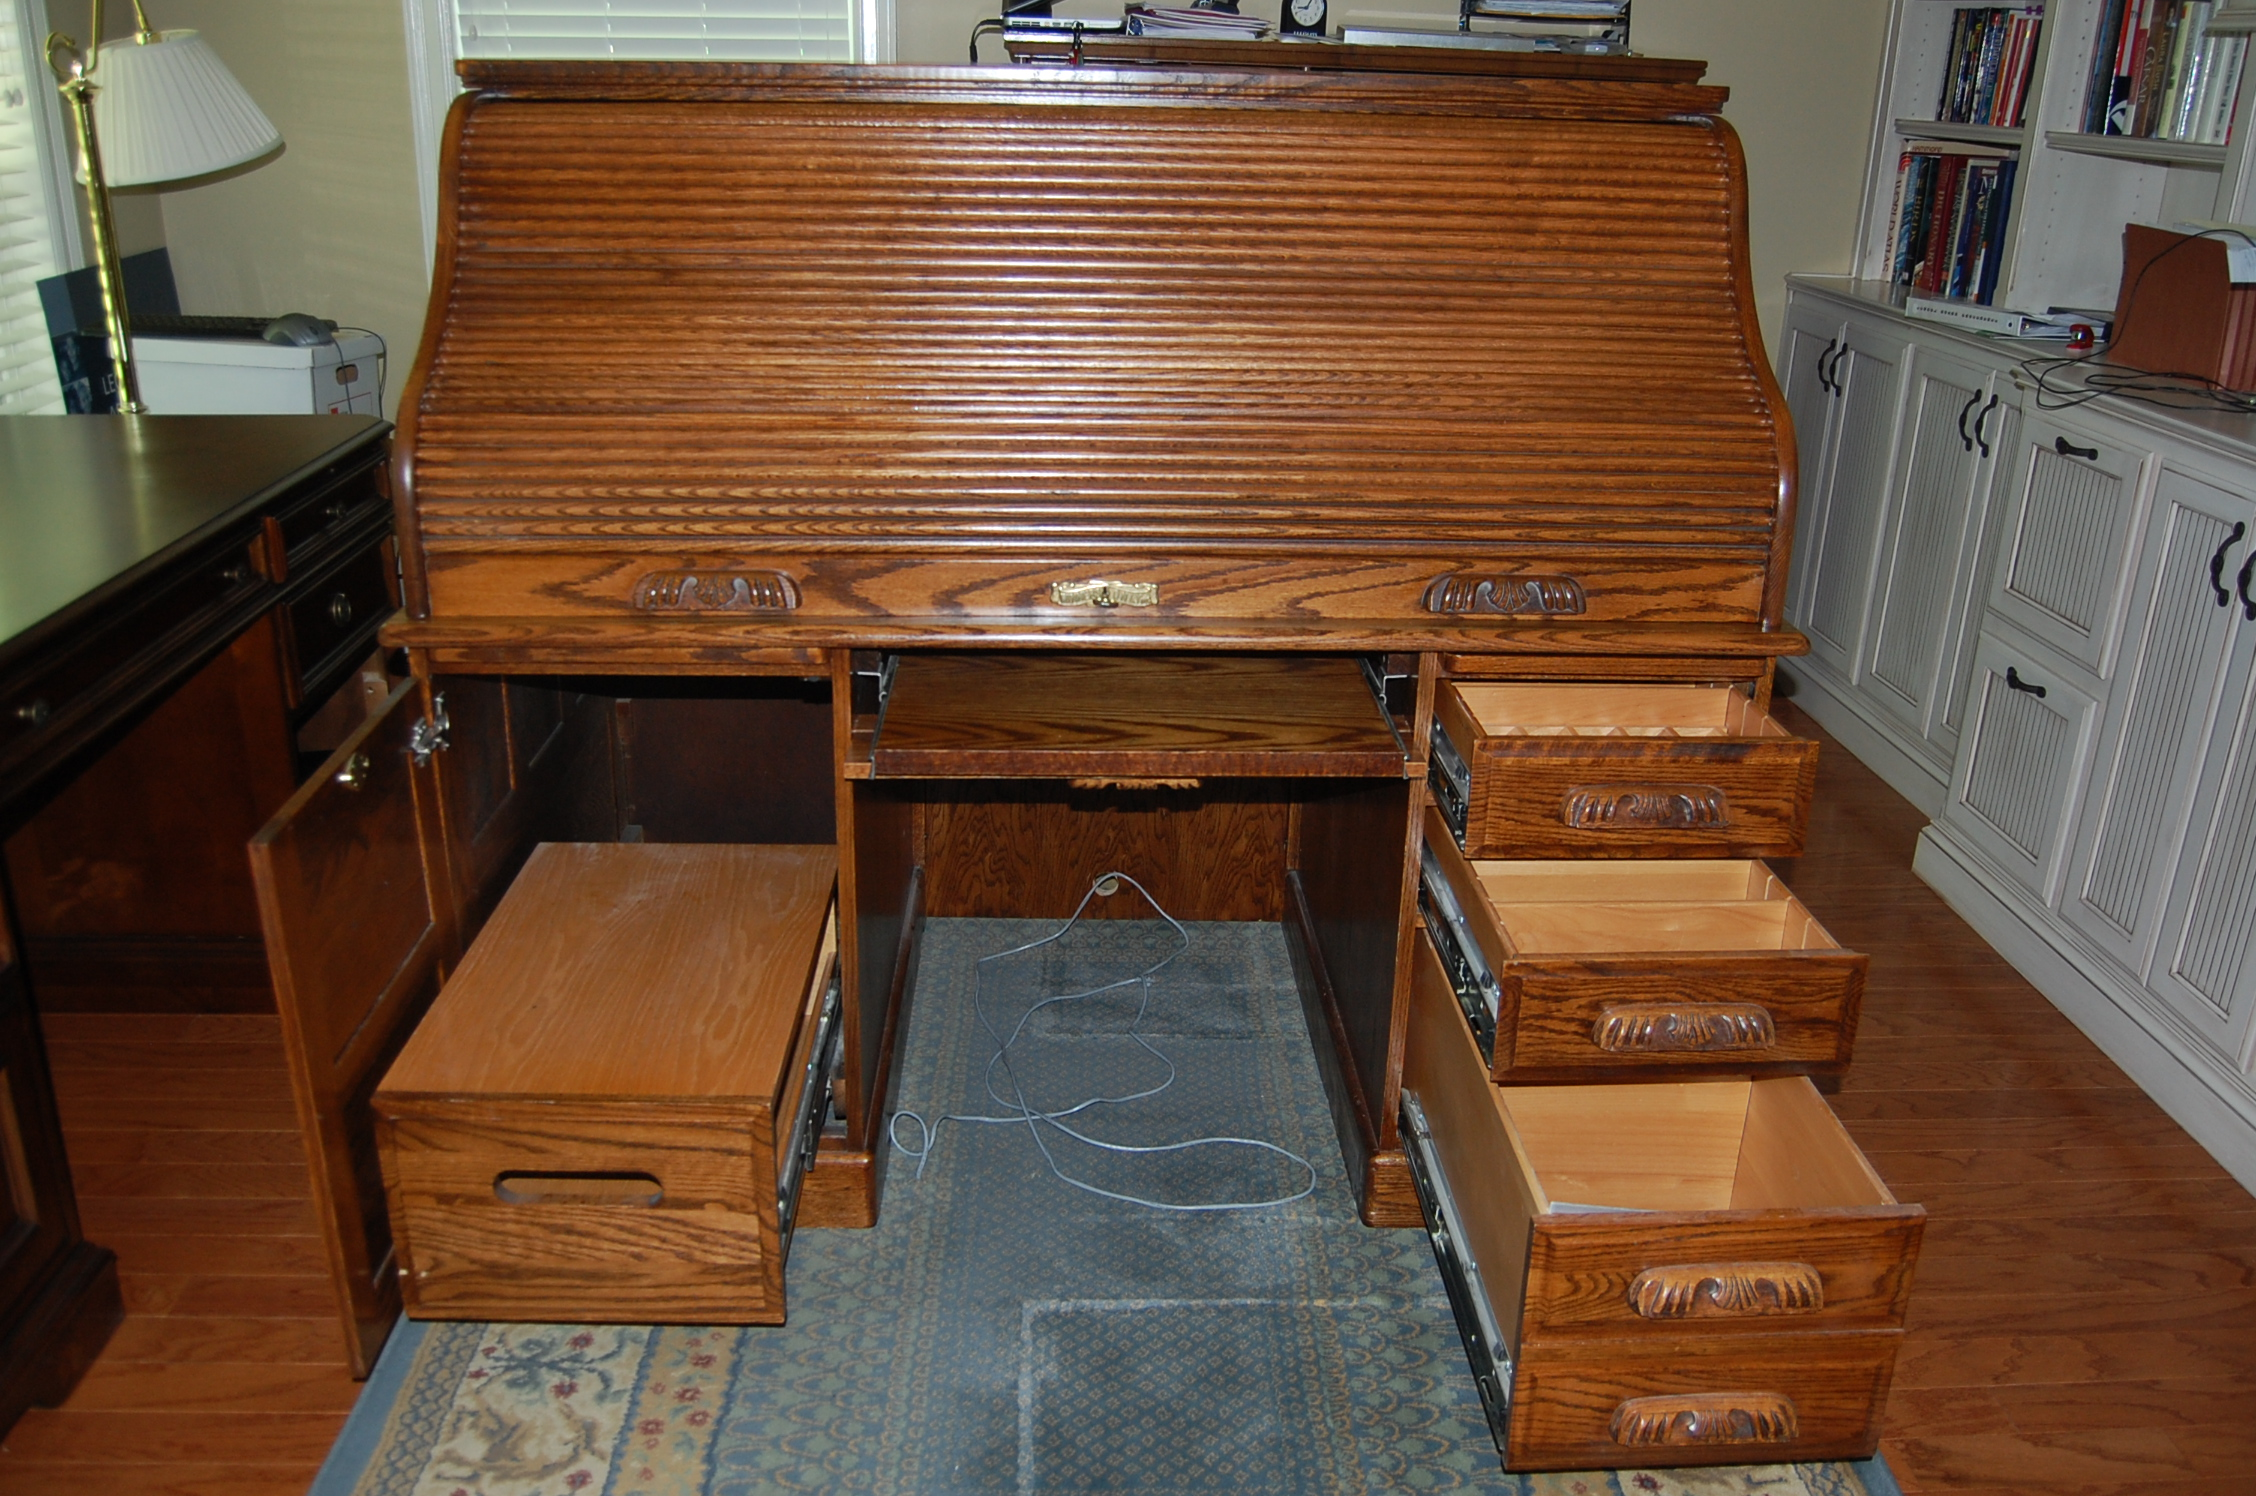 Winners Only Roll Top Desk Antique Appraisal Instappraisal